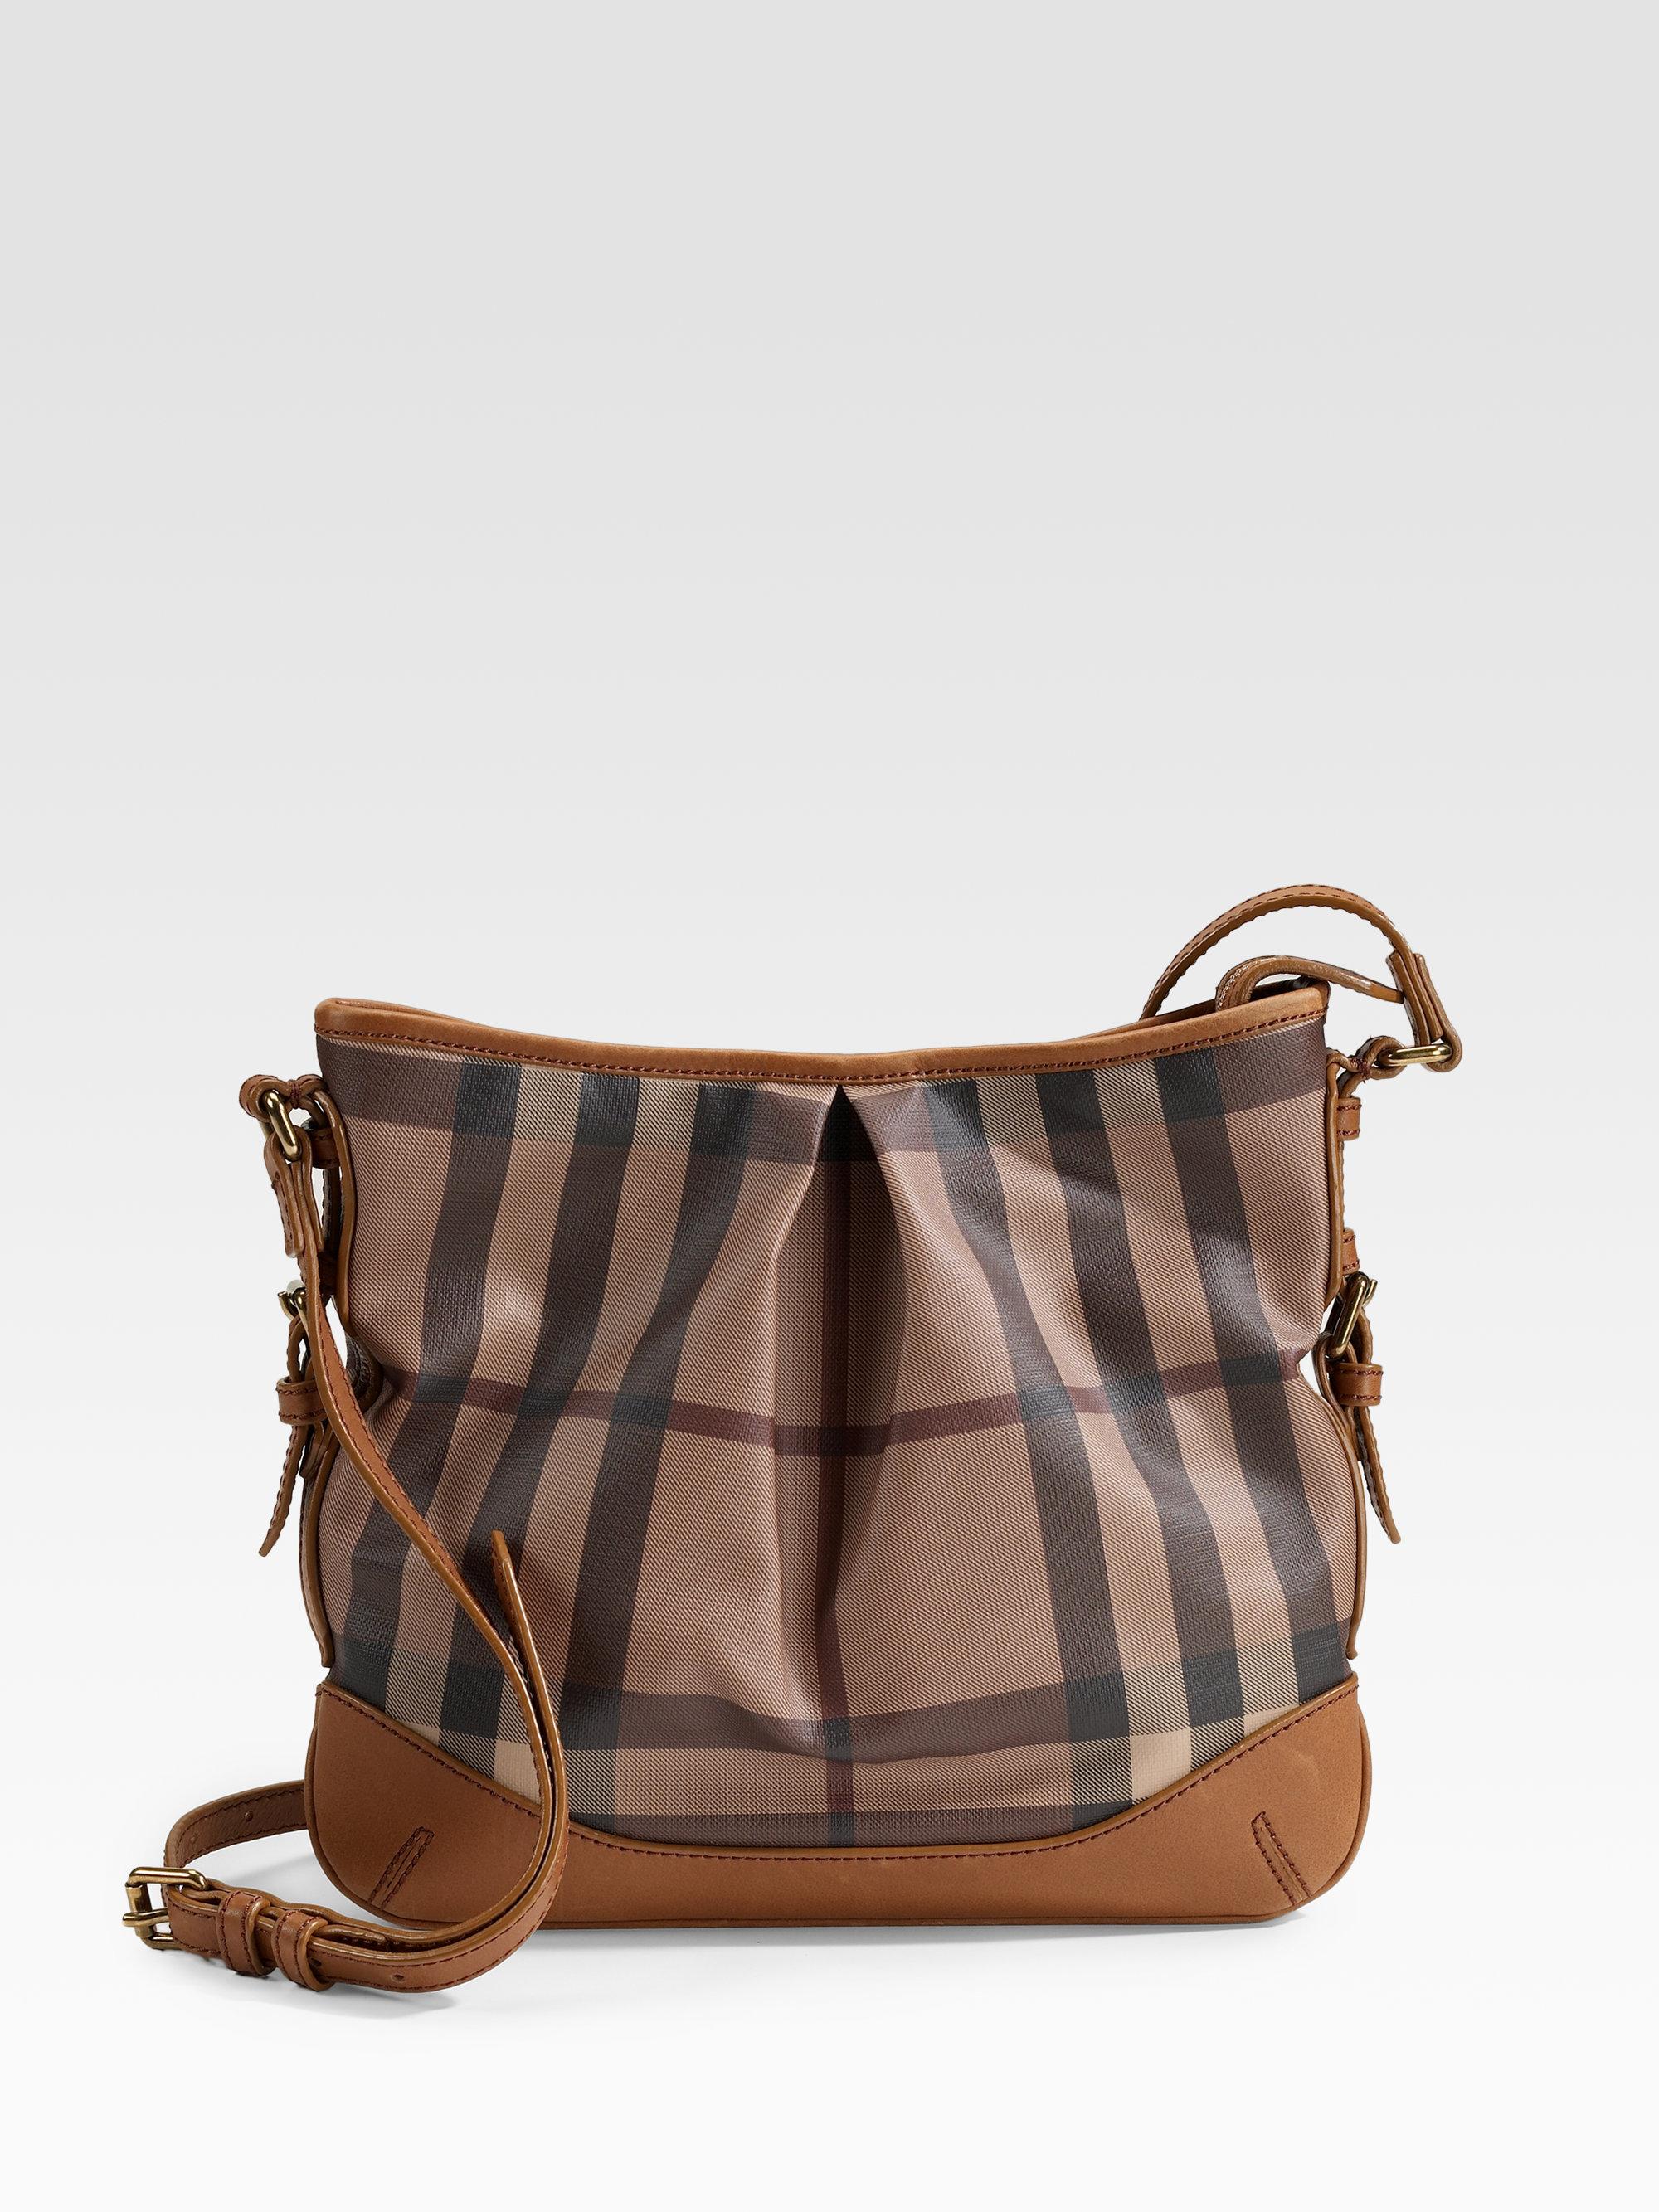 a2d1346b5290 Lyst - Burberry Smoke Check Cross Body Bag in Brown